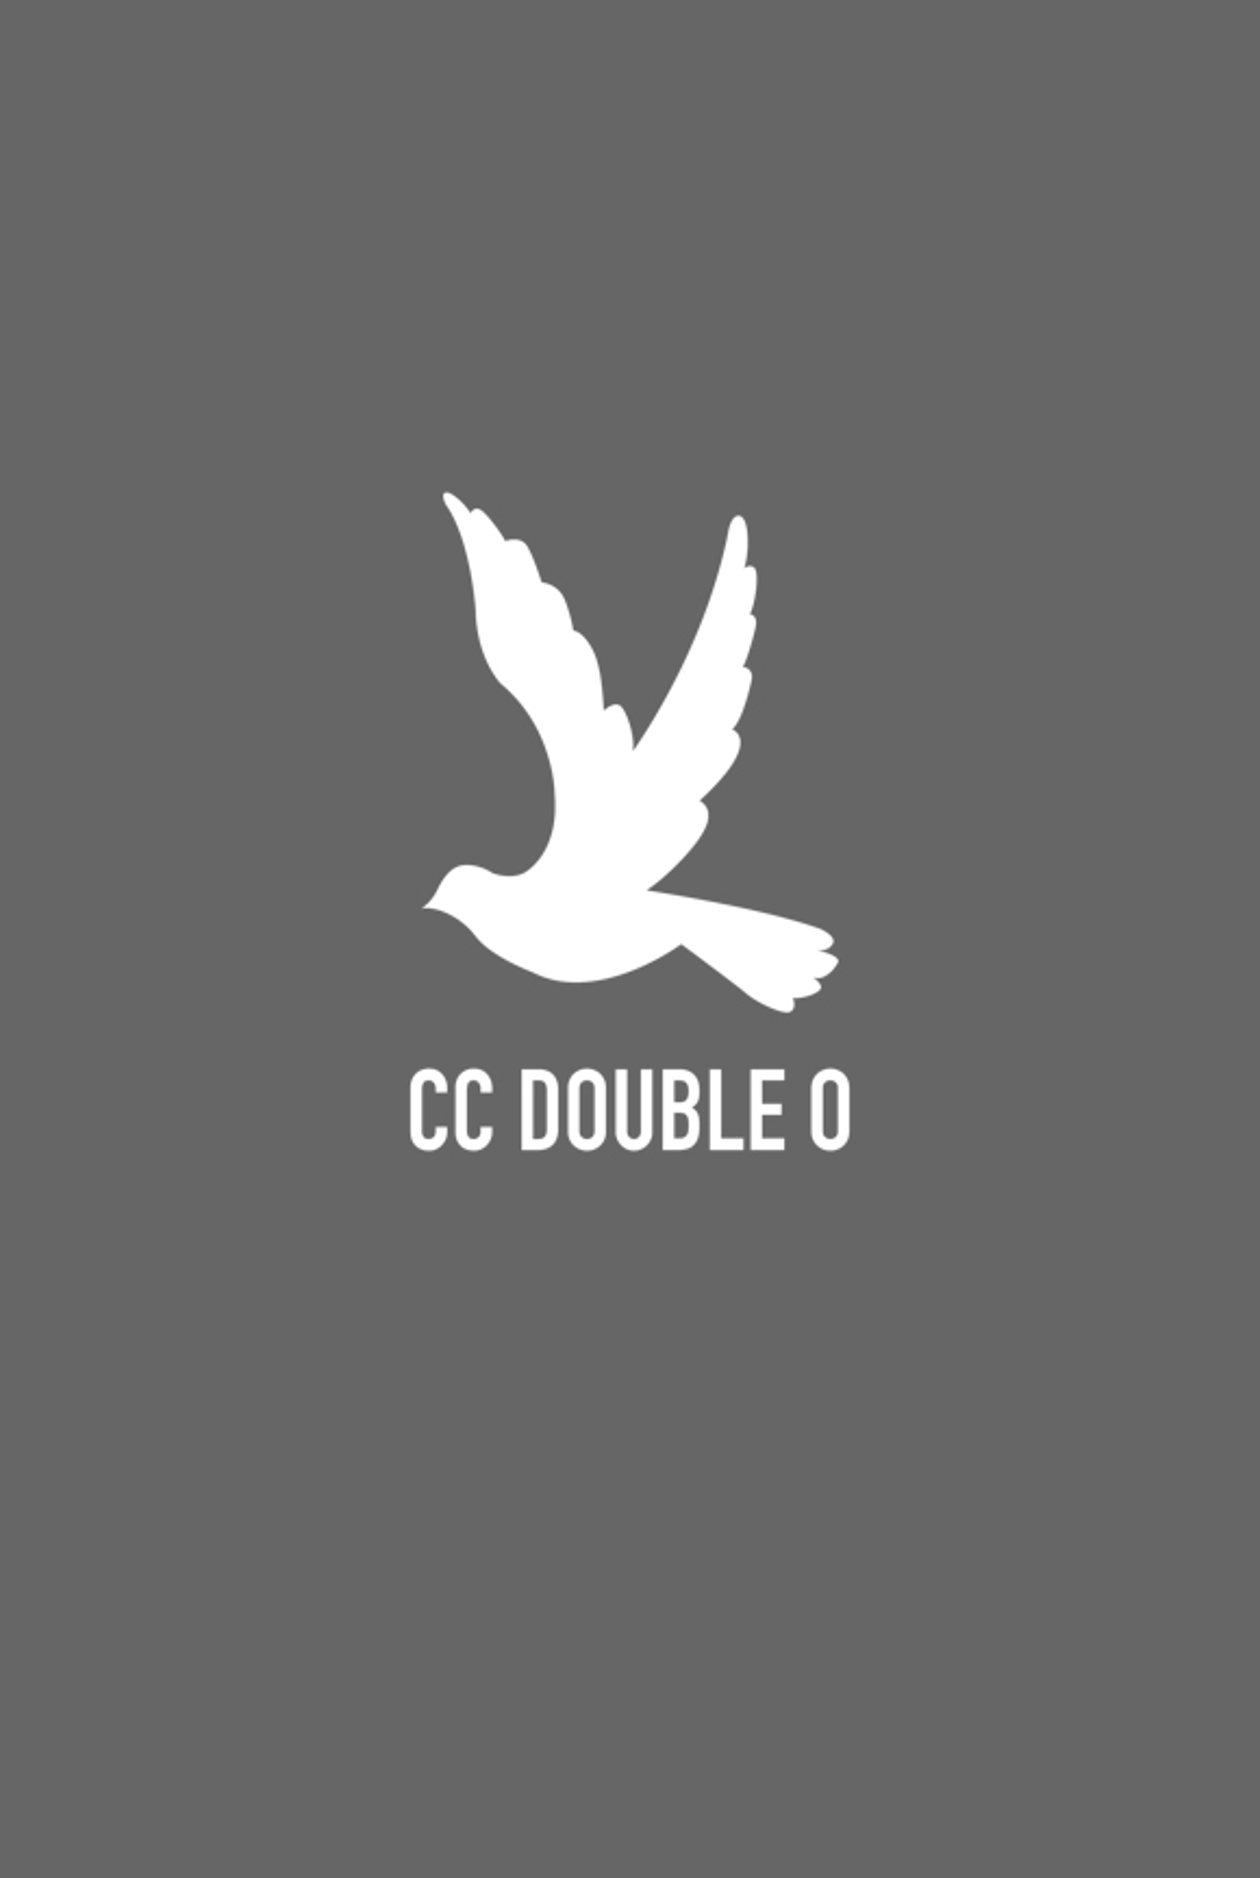 CC DOUBLE O Badge iPhone 6 Plus Case